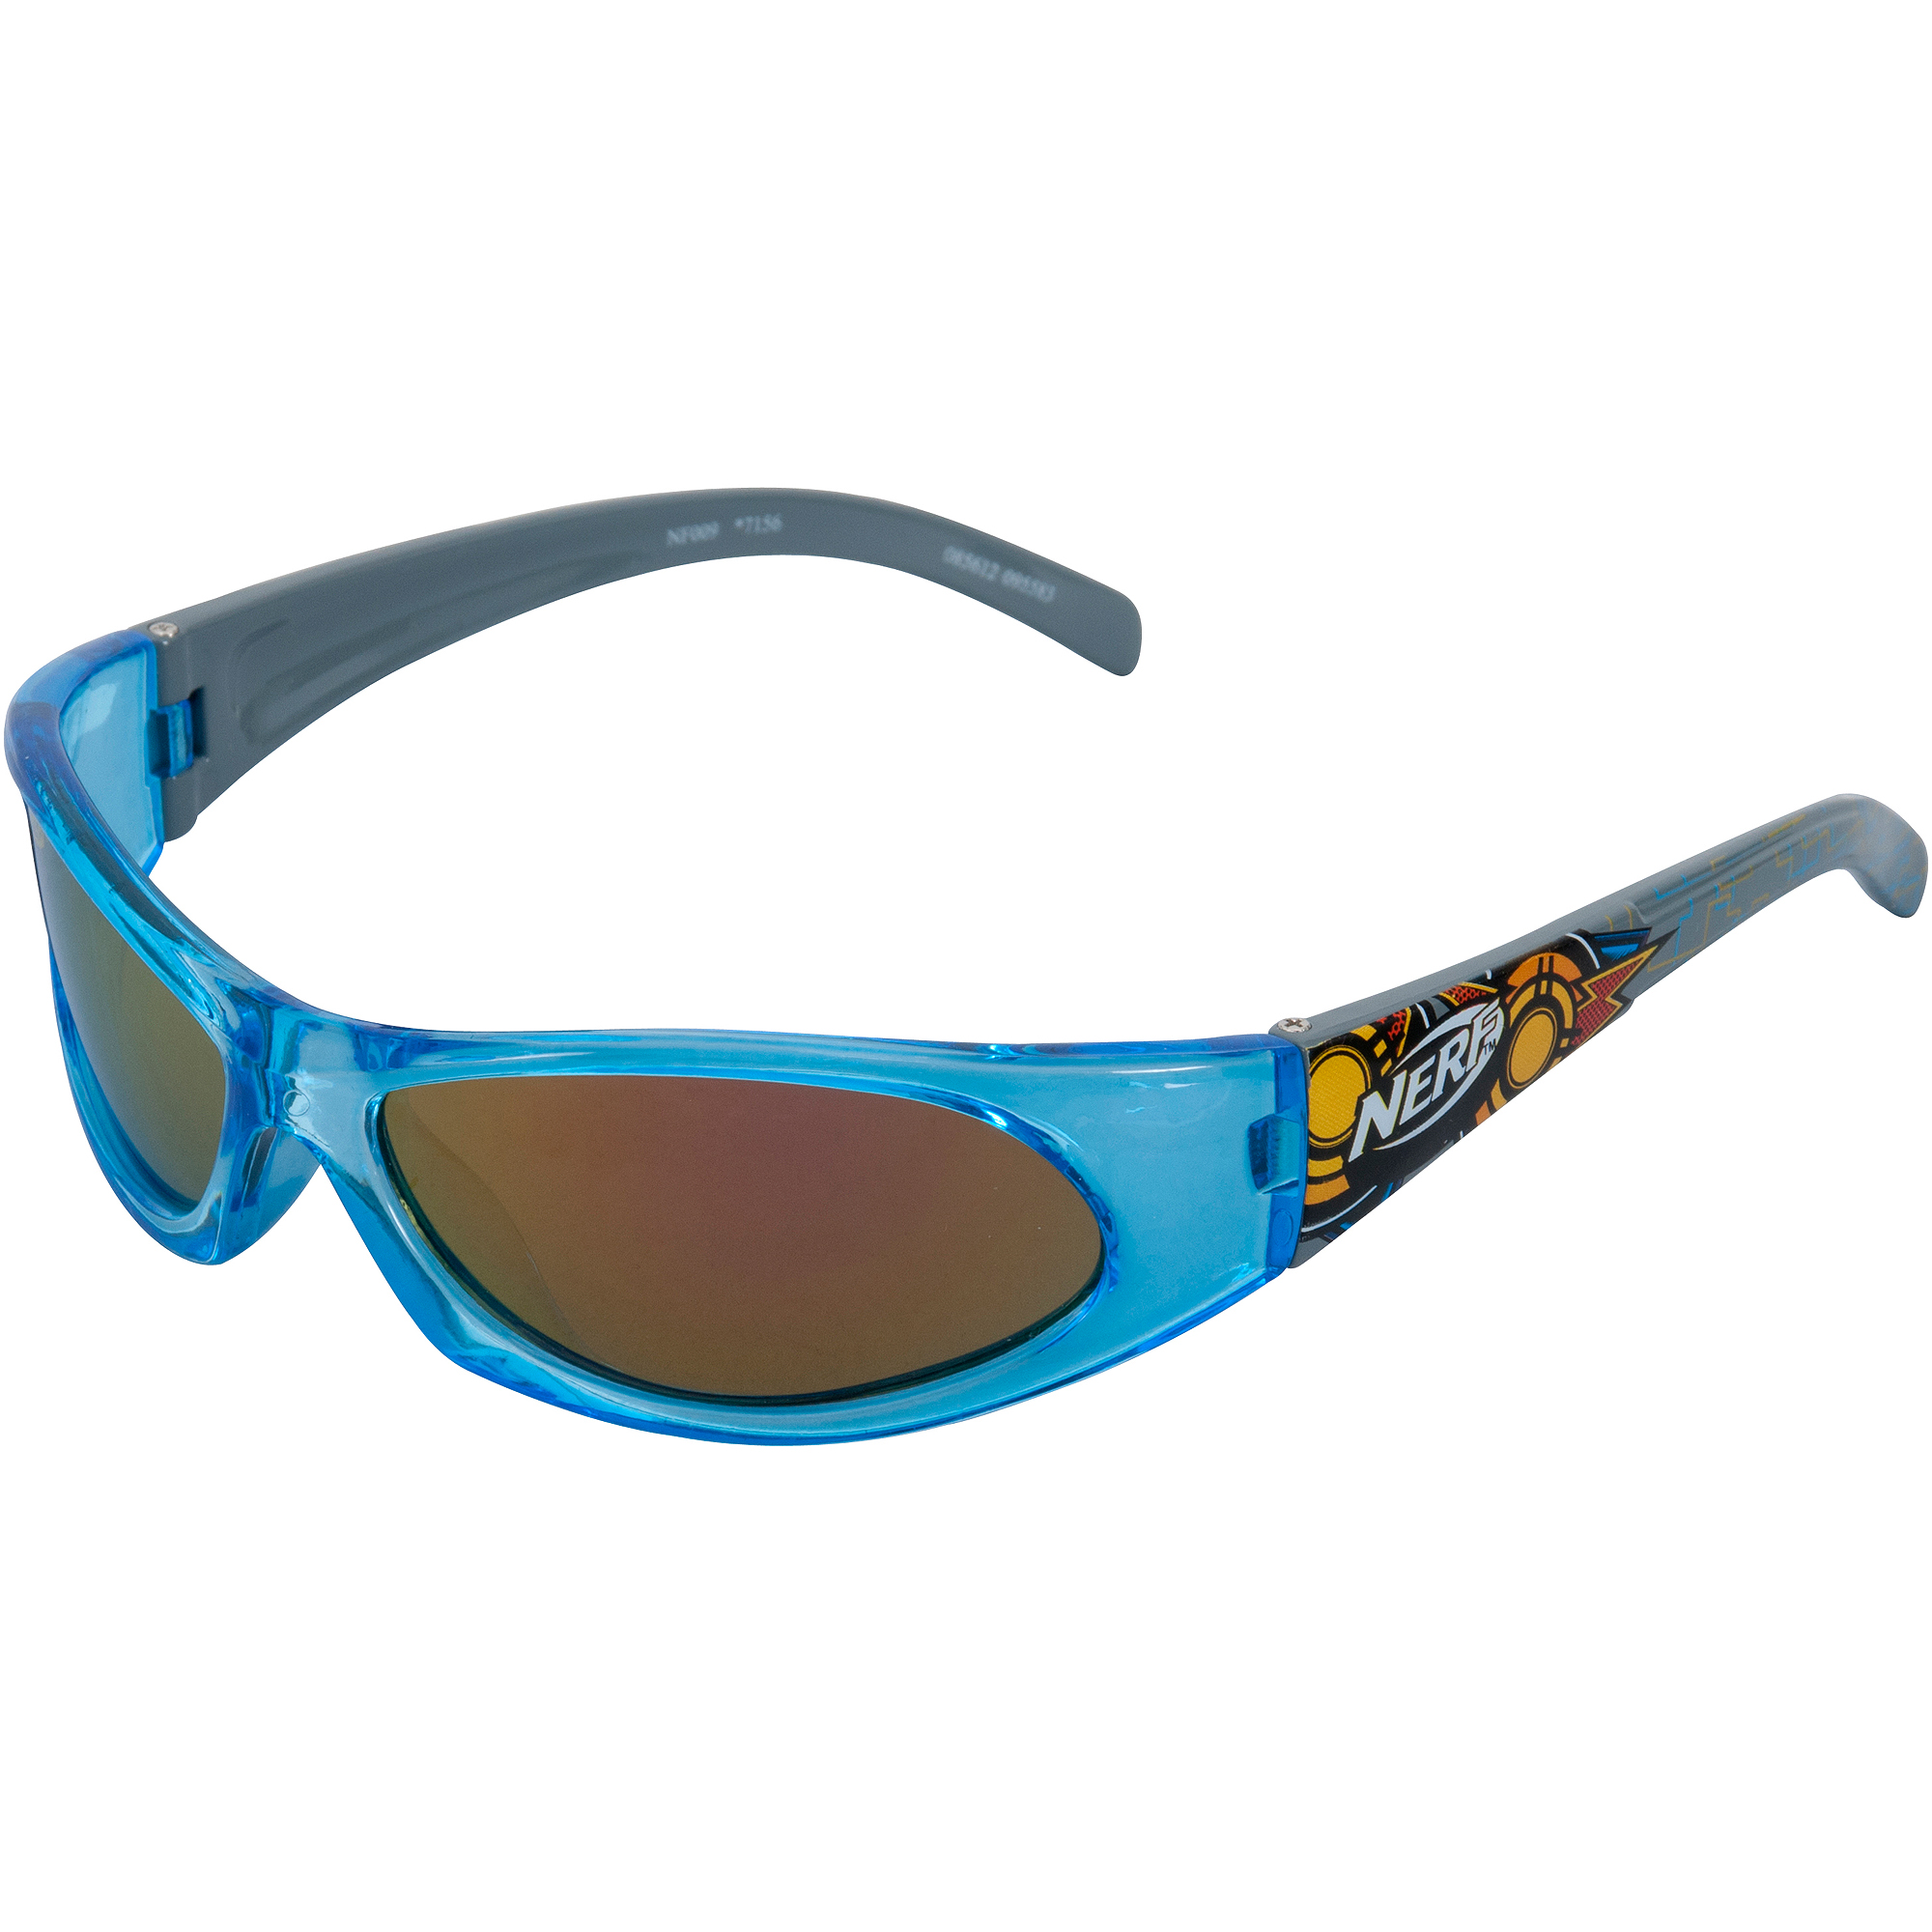 nerf childrens sunglasses walmart